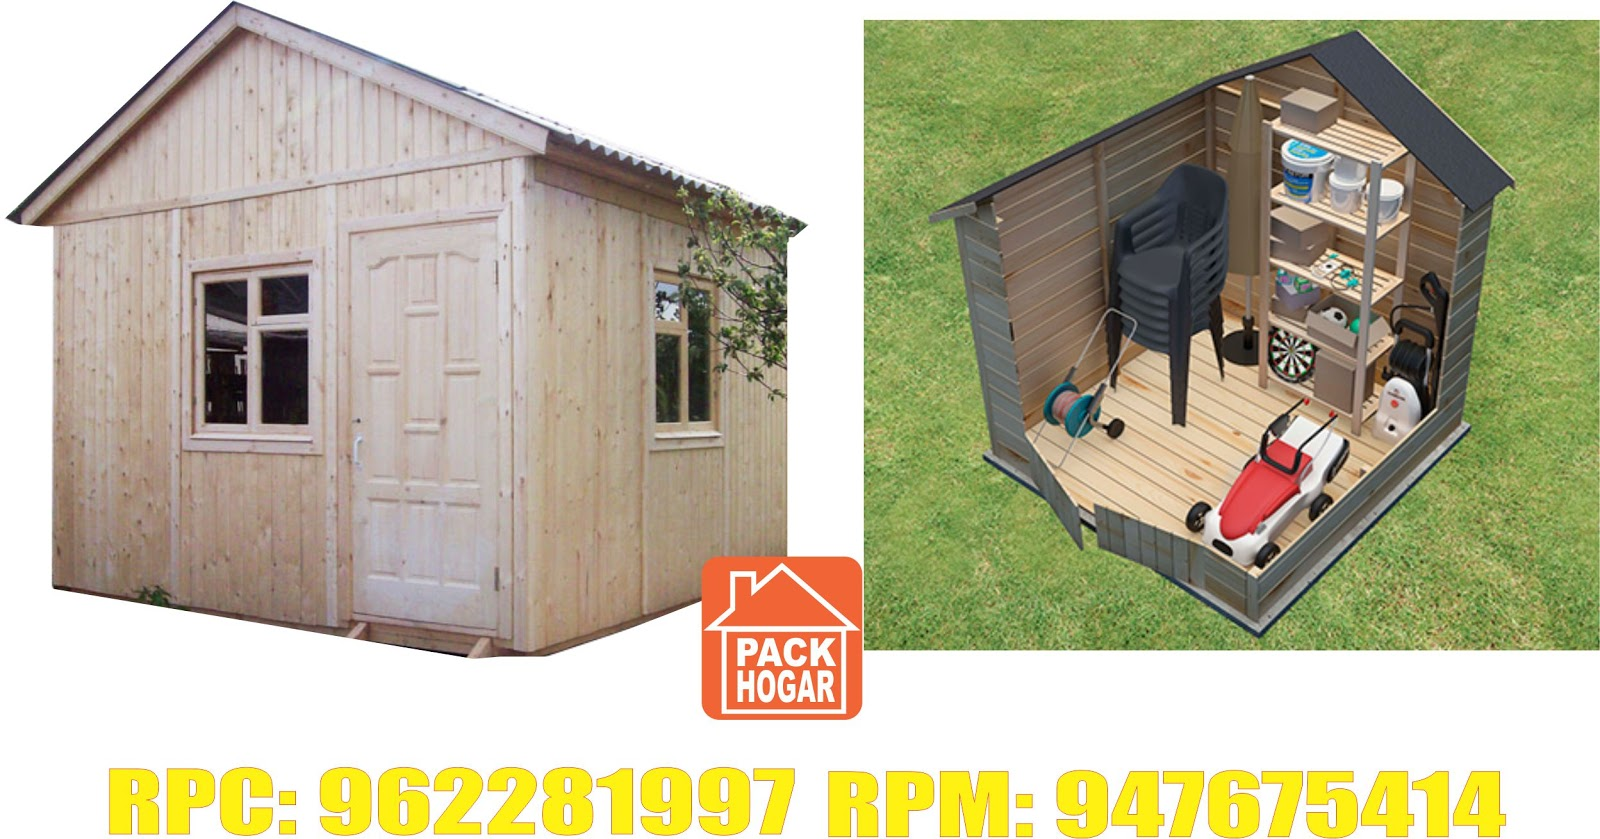 Casas de campo playa de madera prefabricadas for Casas de campo prefabricadas